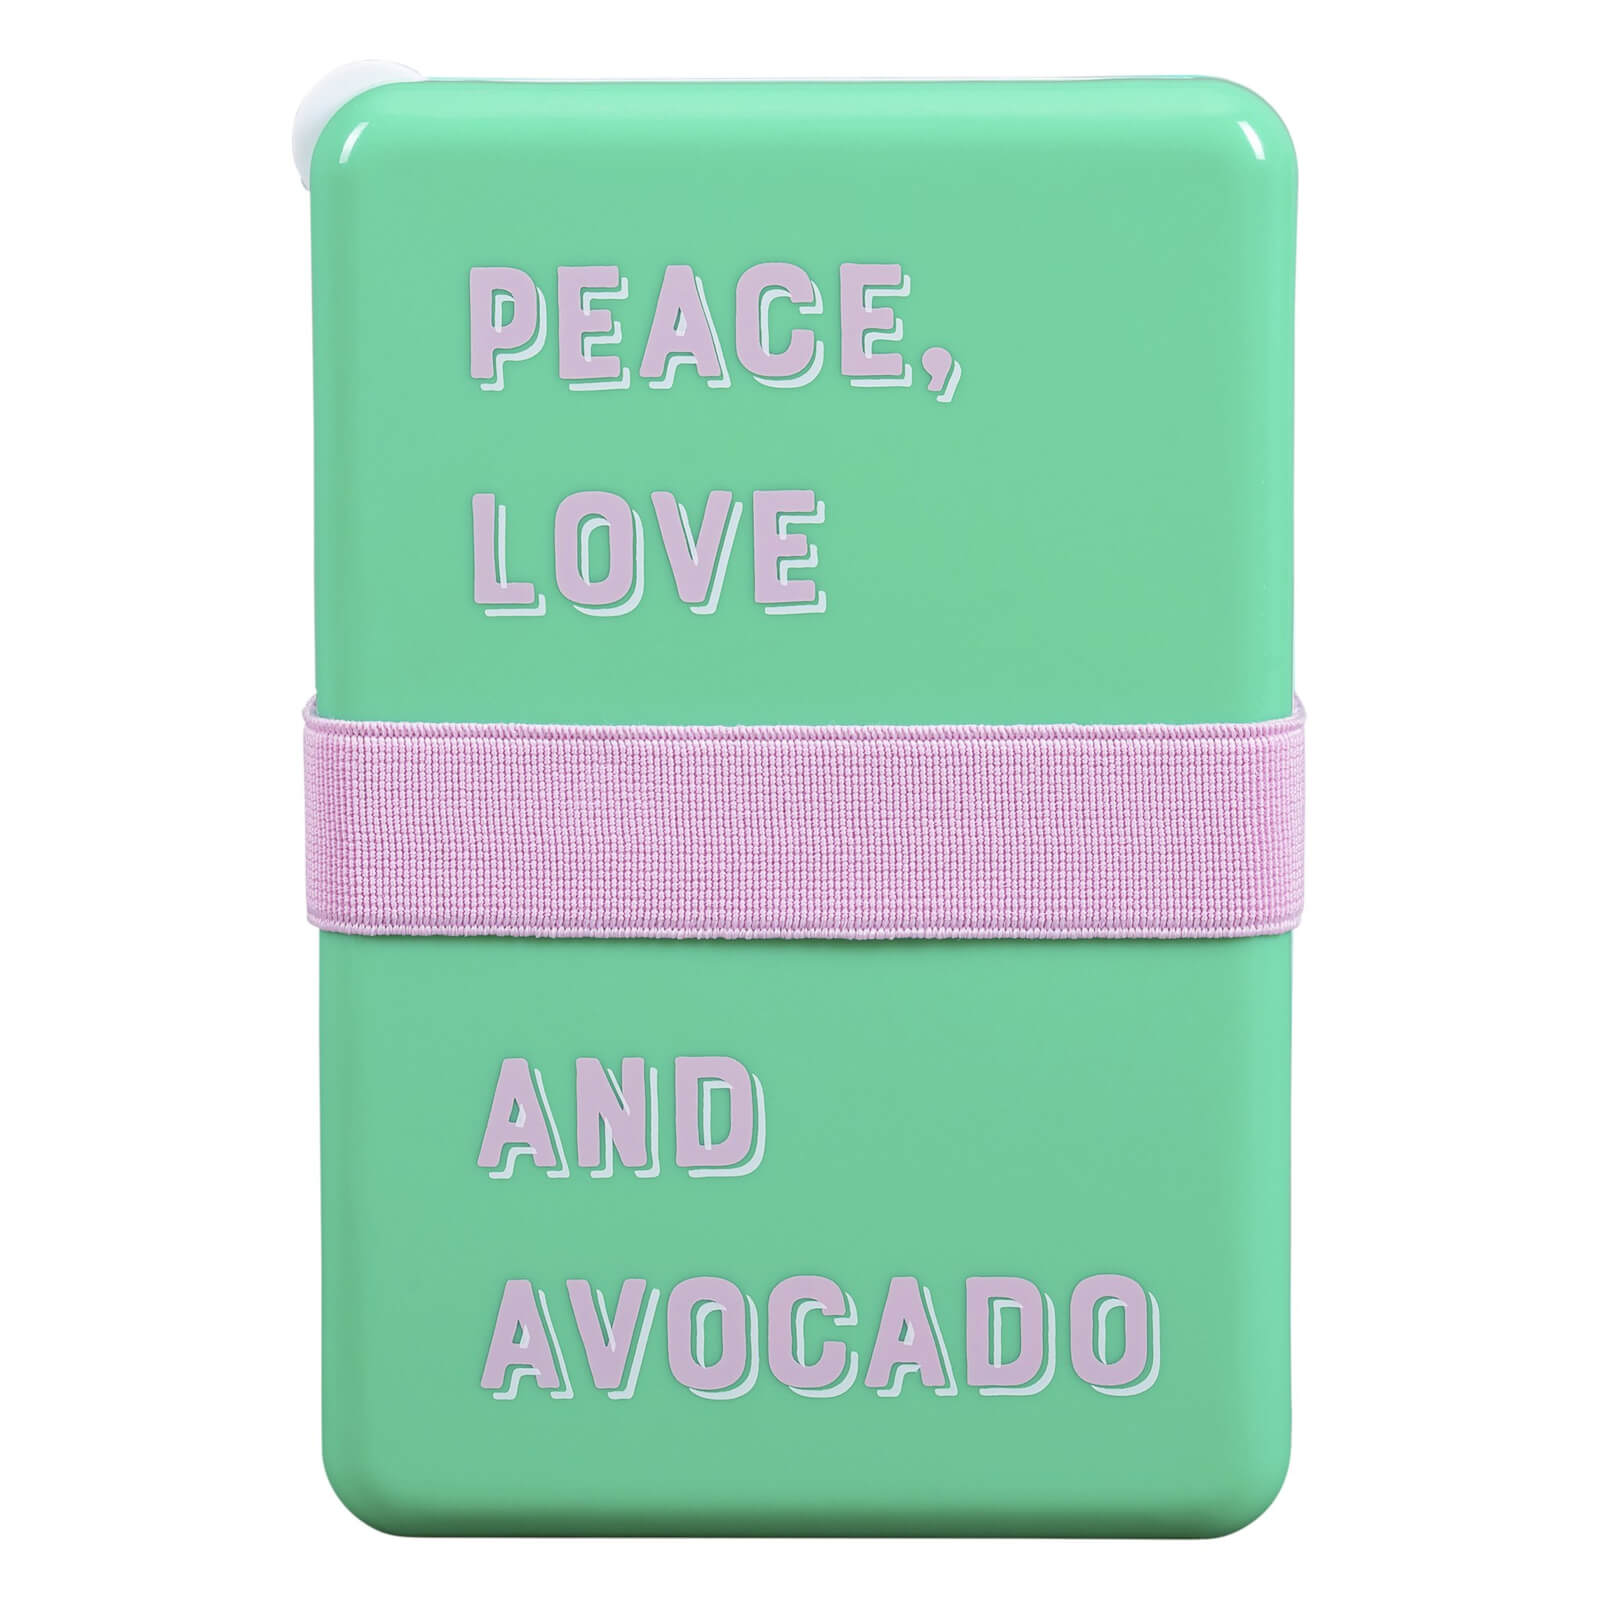 Image of Yes Studio Avocado Lunch Box